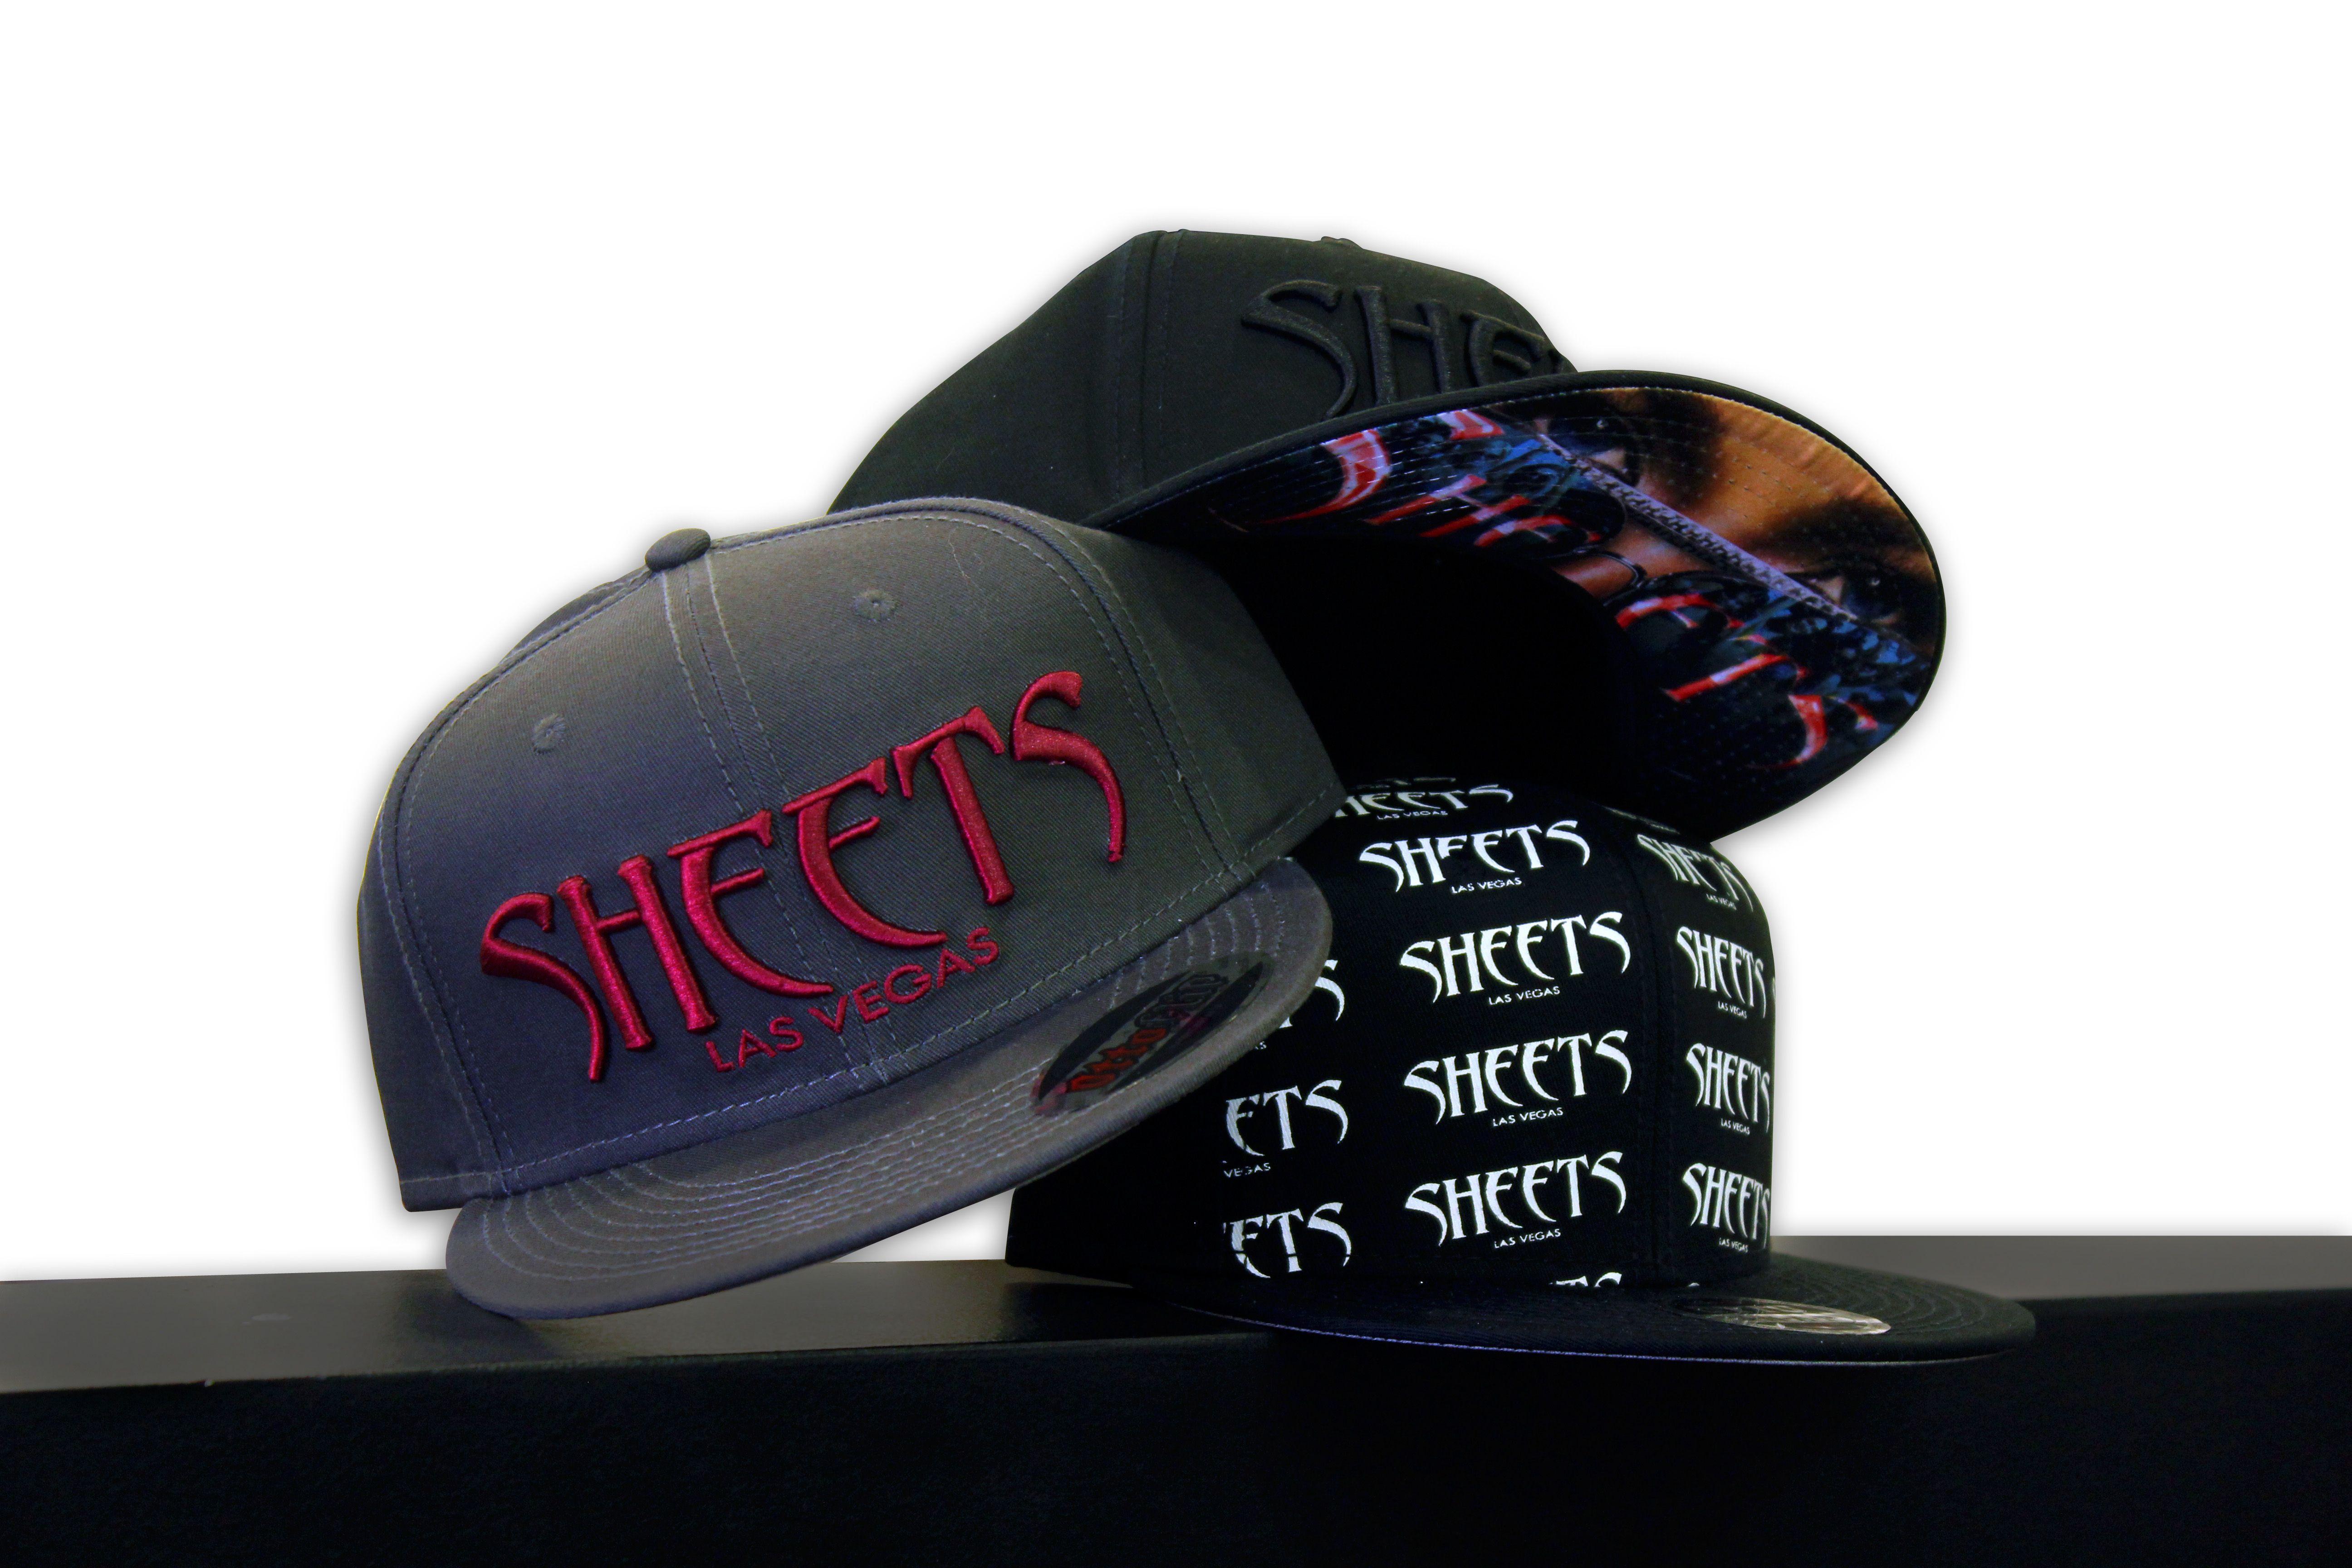 Sheets Vip Swag Gear Www Sheetsvip Com Vegas Baby Nightclubs Dayclubs Vegas Baby Night Club Swag